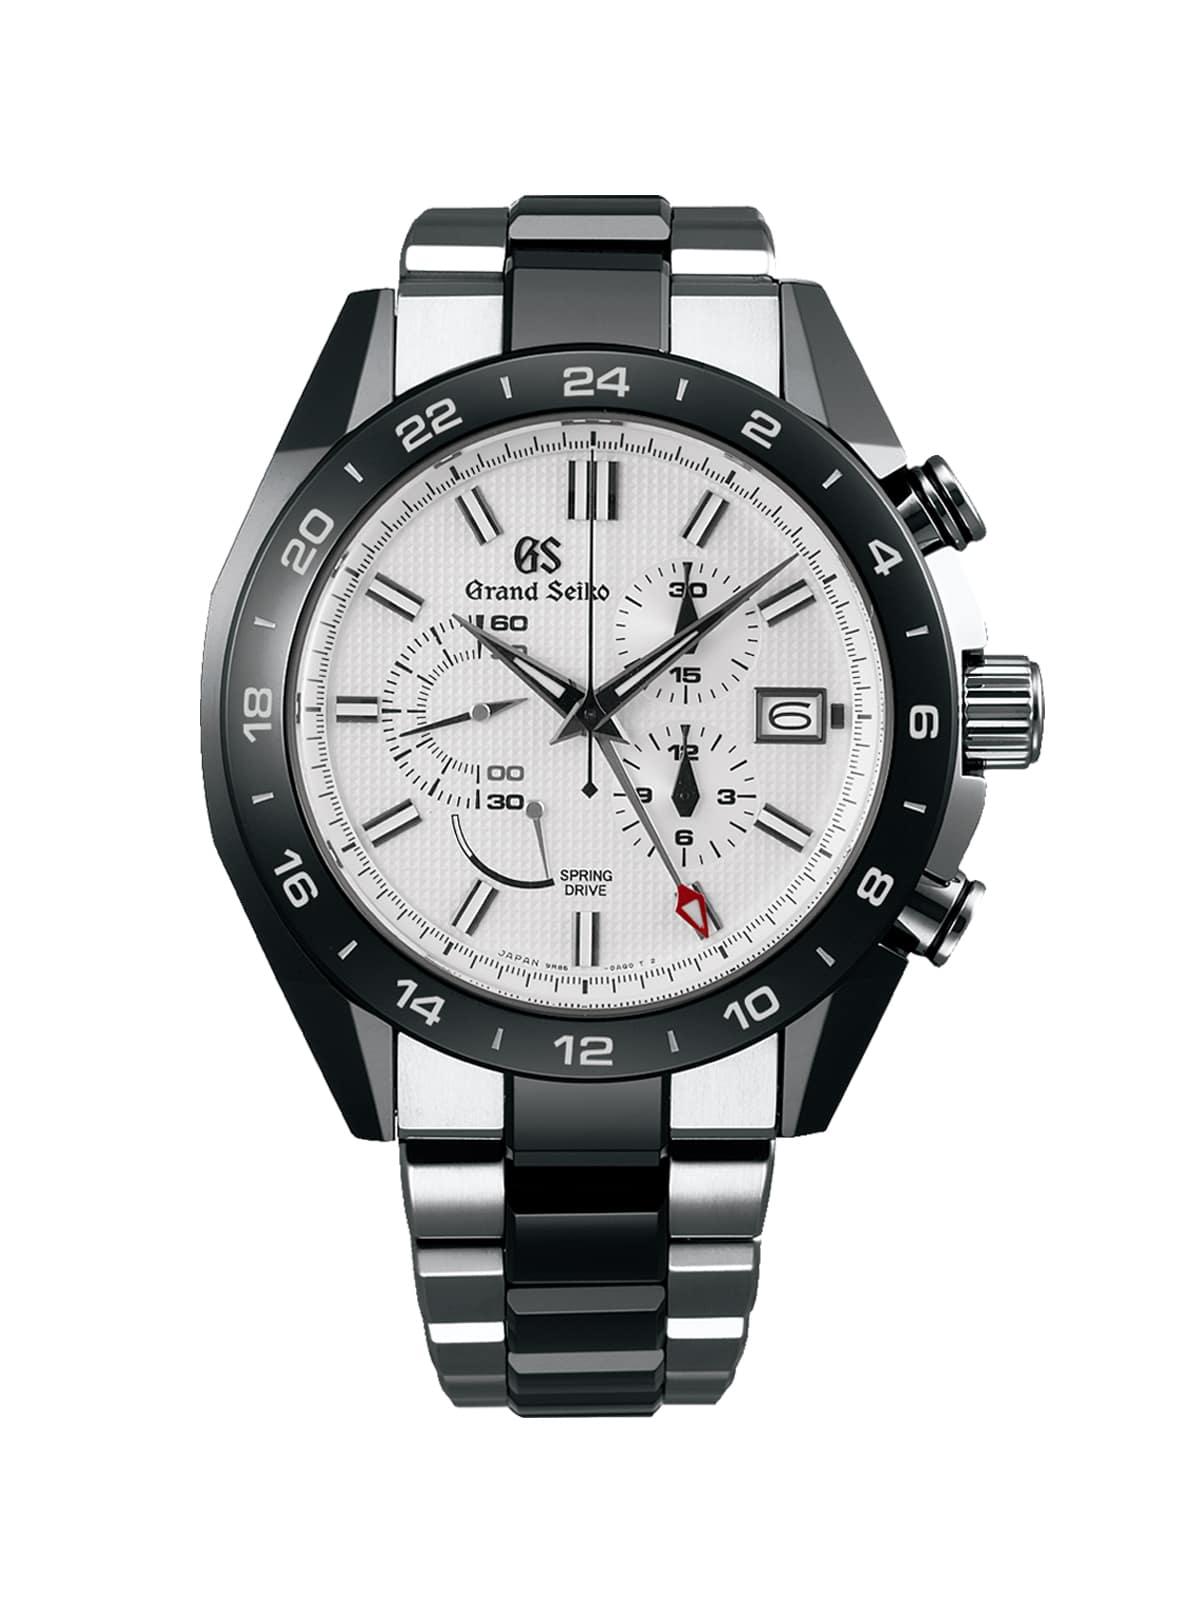 Grand Seiko SBGC221 Watch